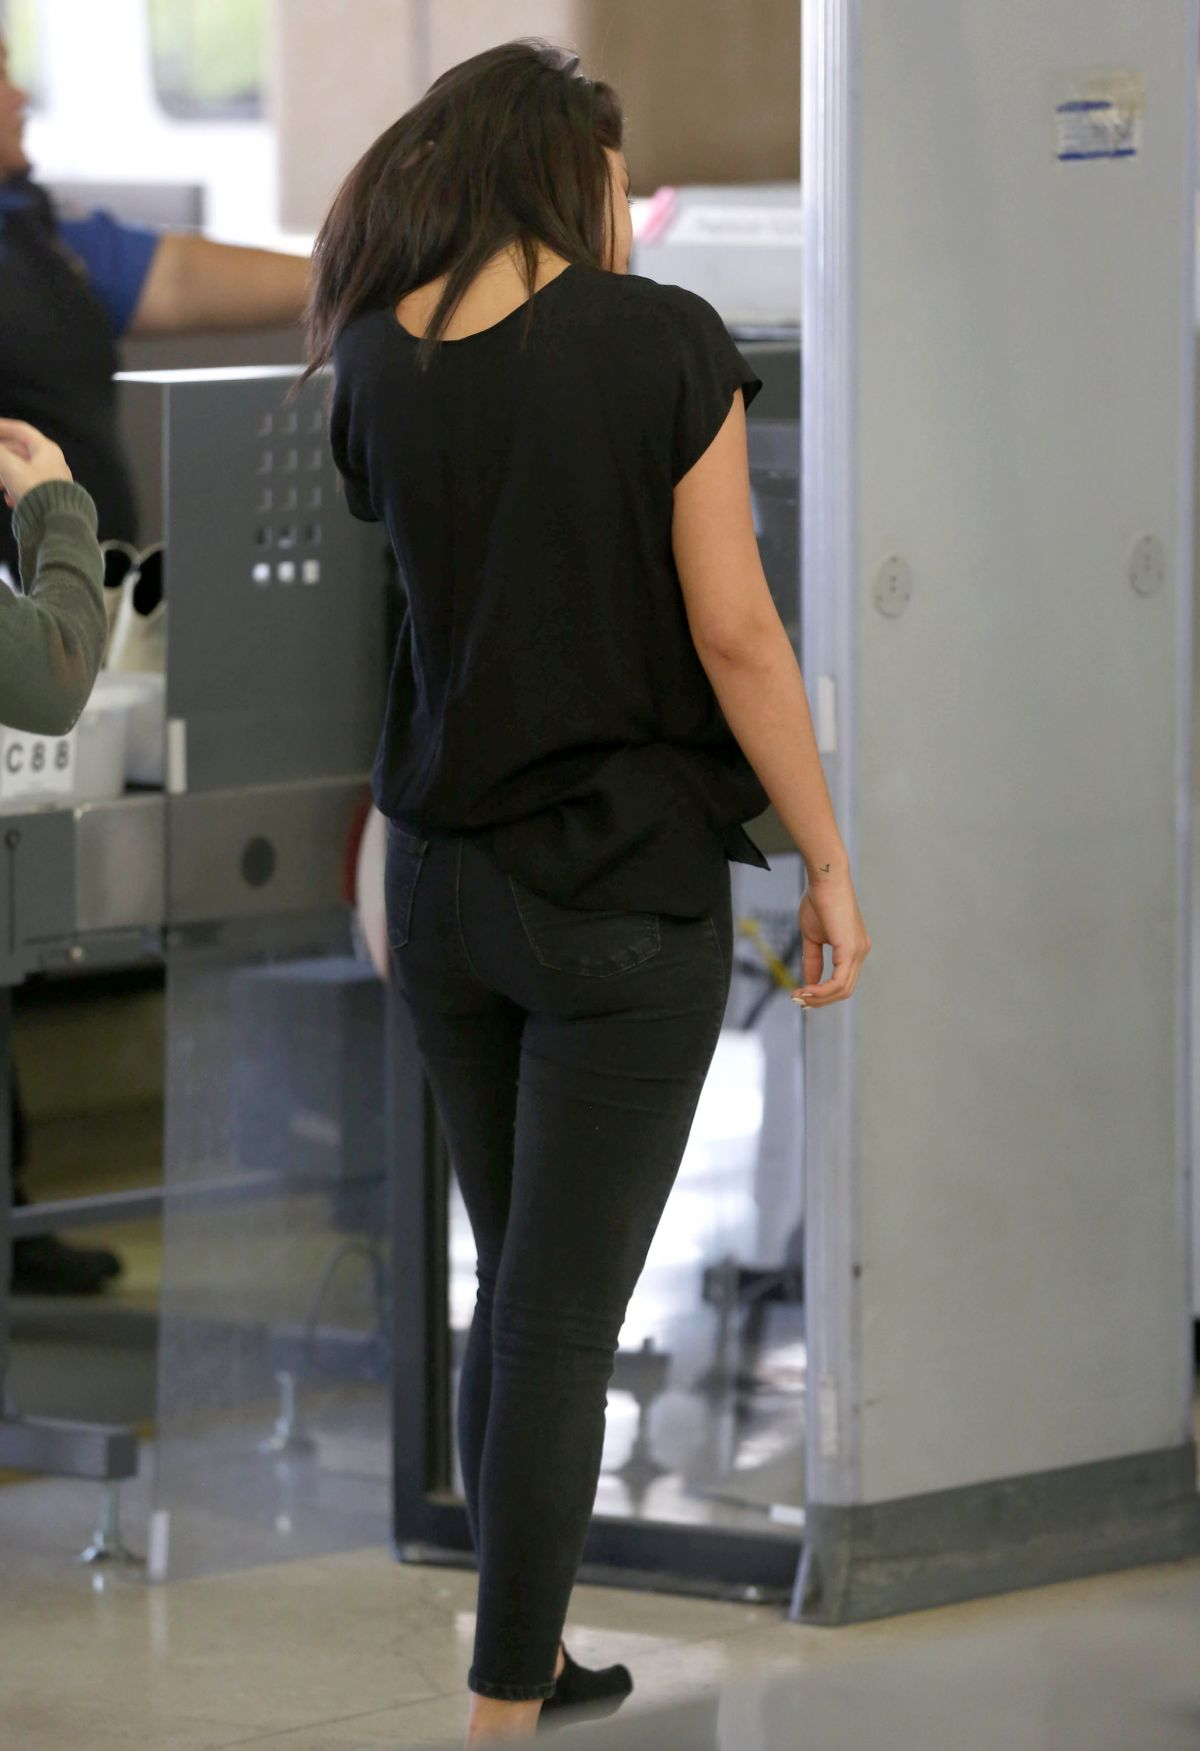 Shoes Selena Gomez Socks Airport